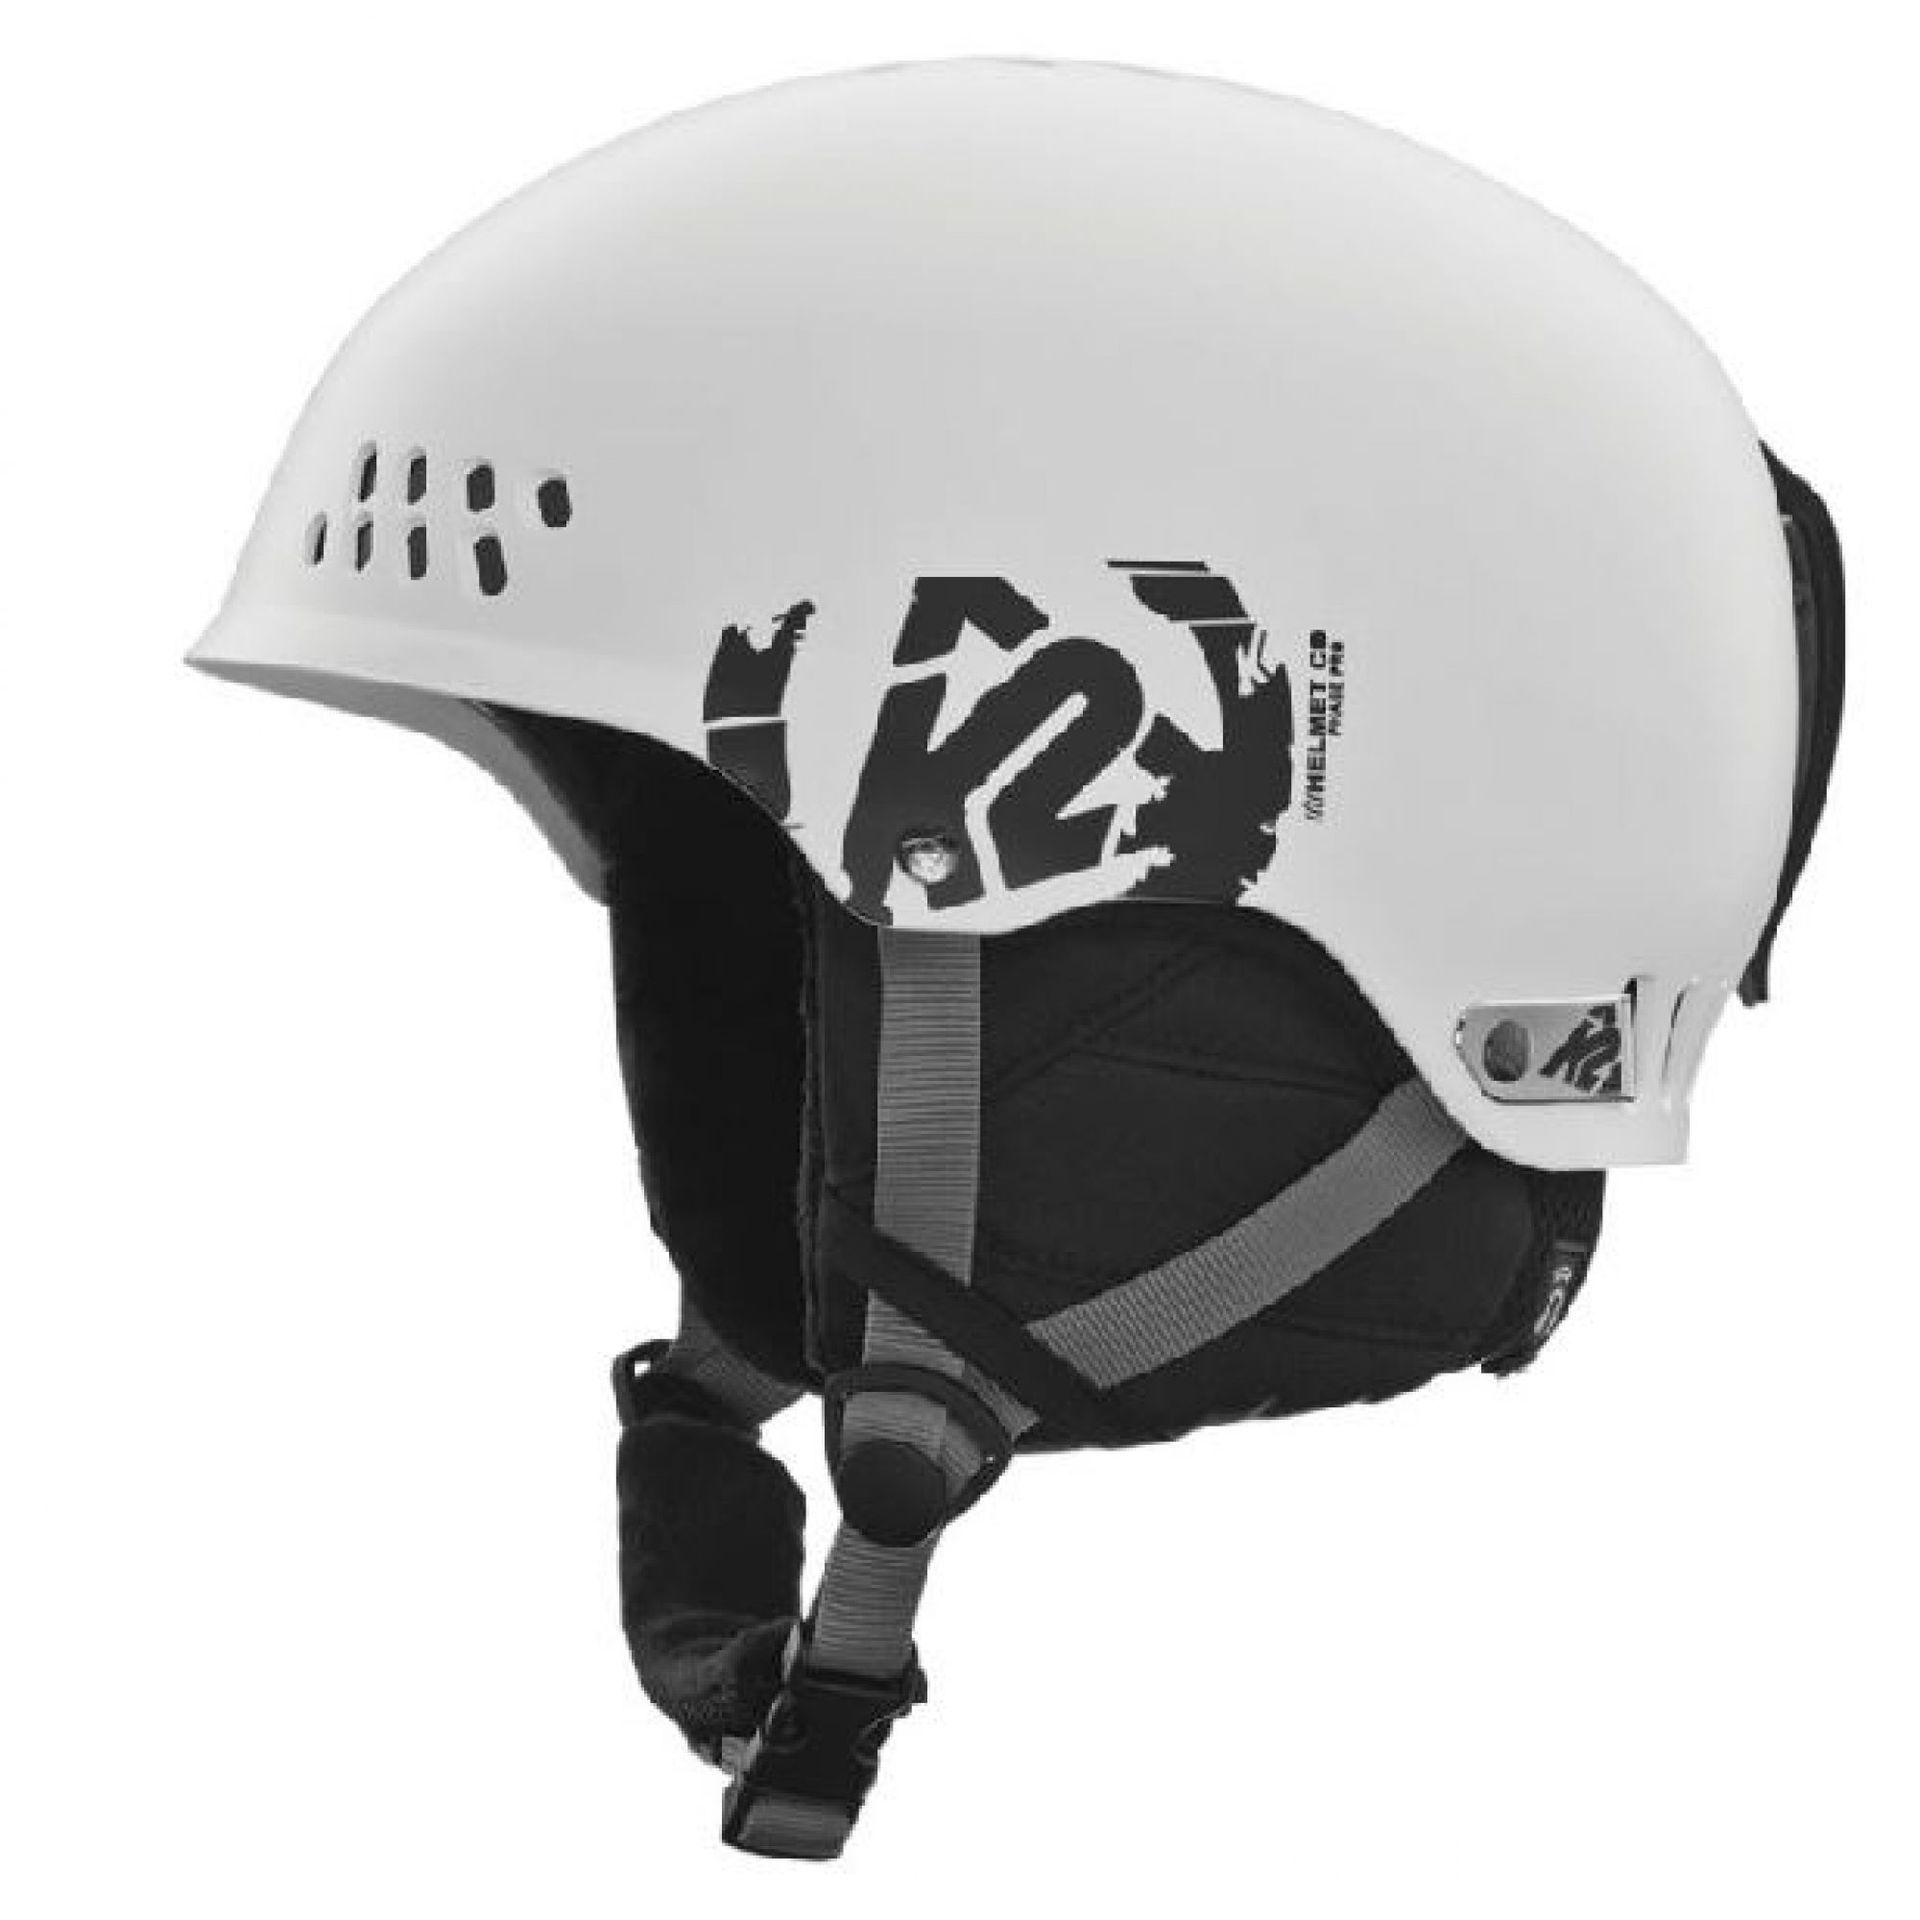 KASK K2 SPORT PHASE PRO WHITE